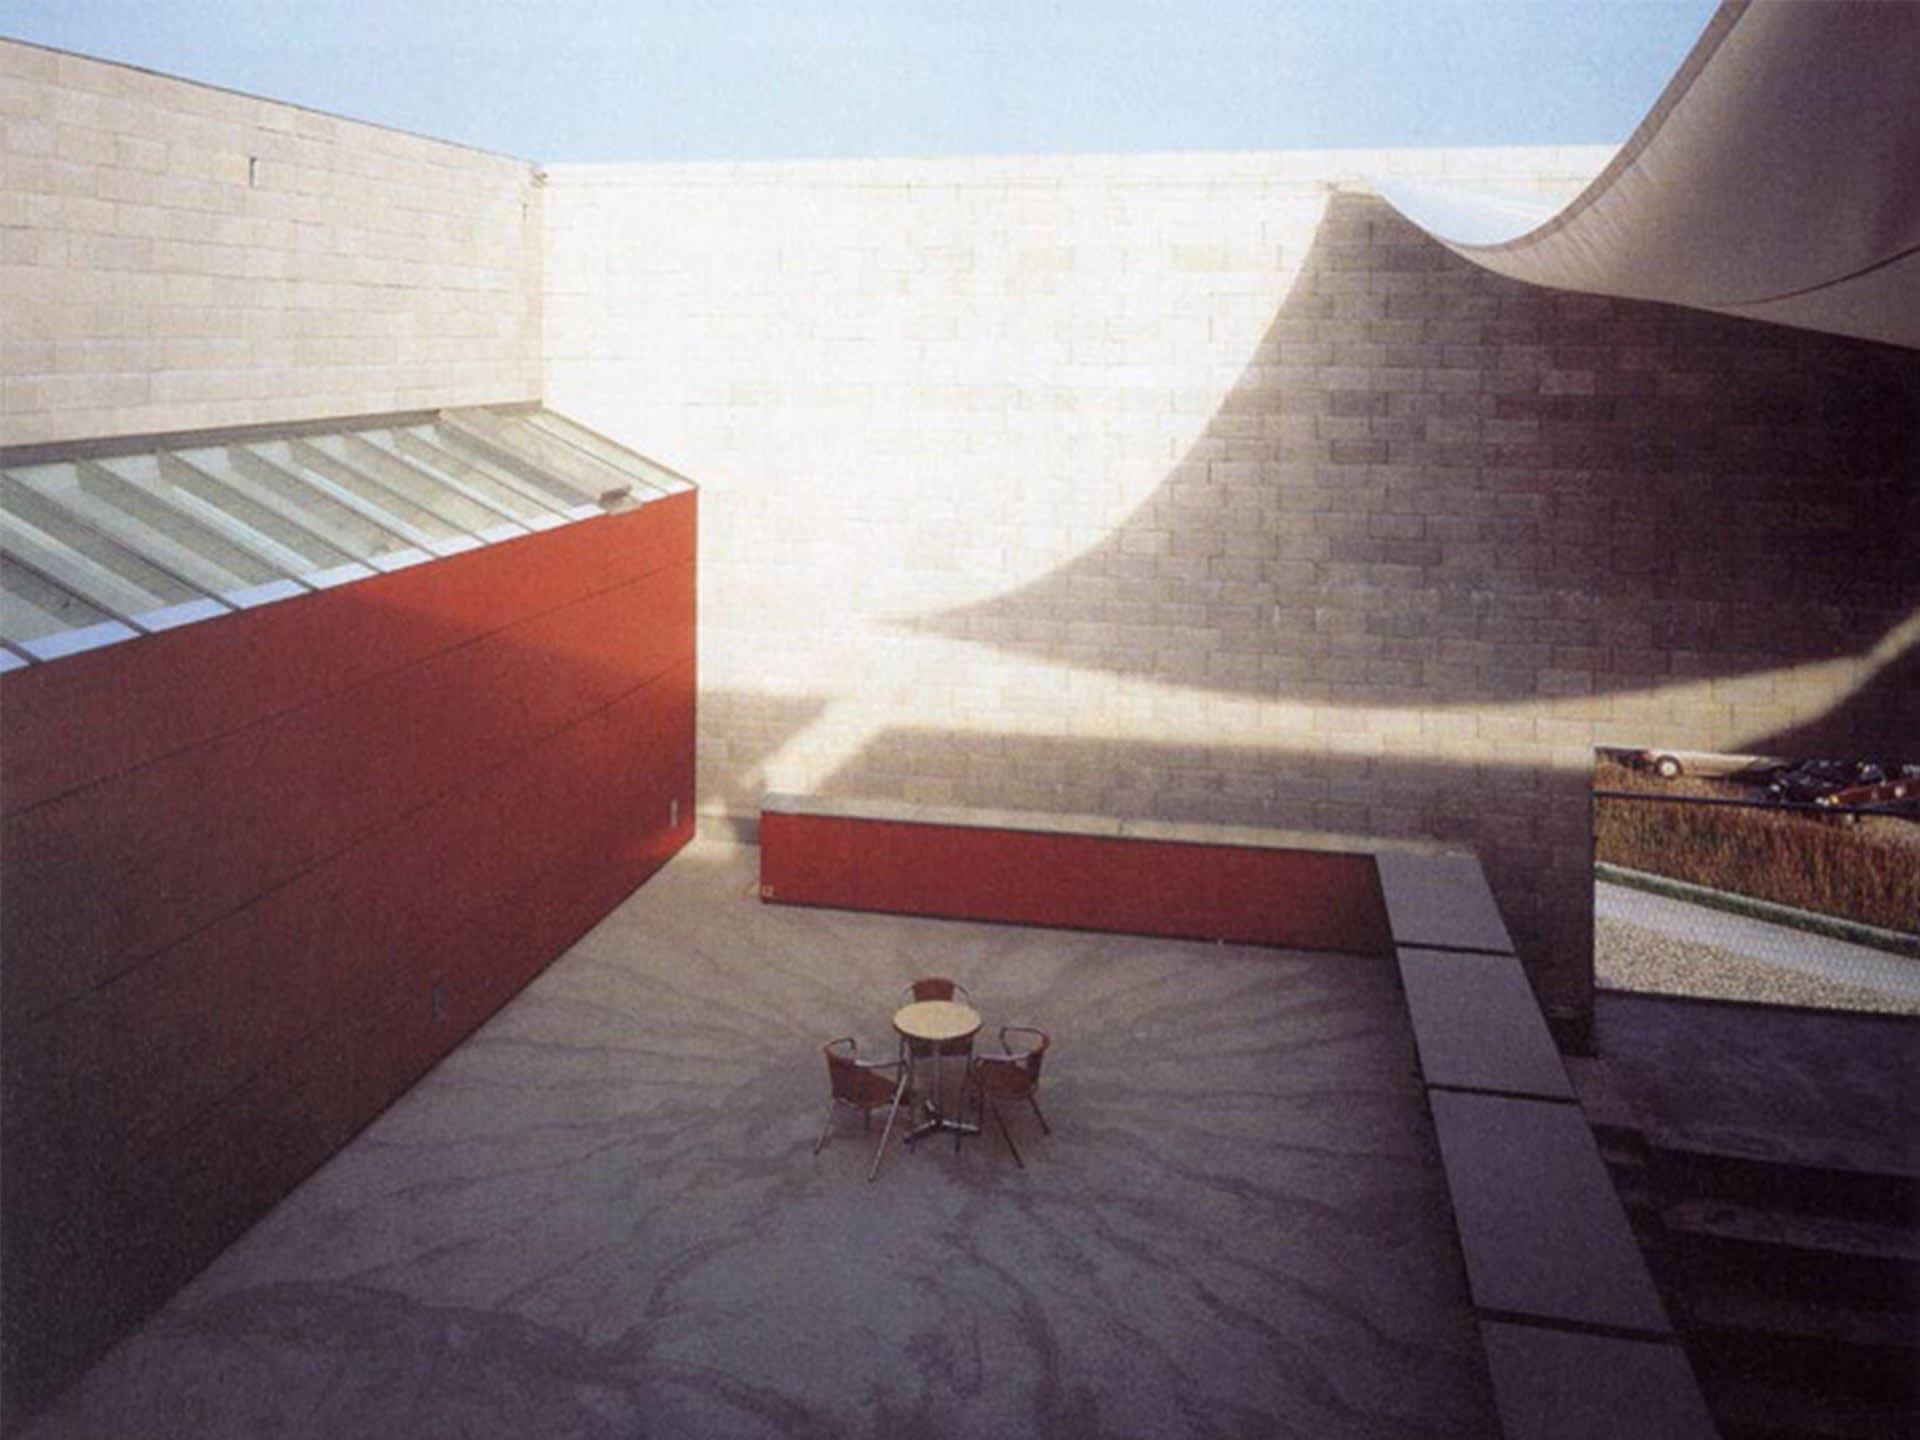 Atlas | Courtyard Space by Ortner und Ortner